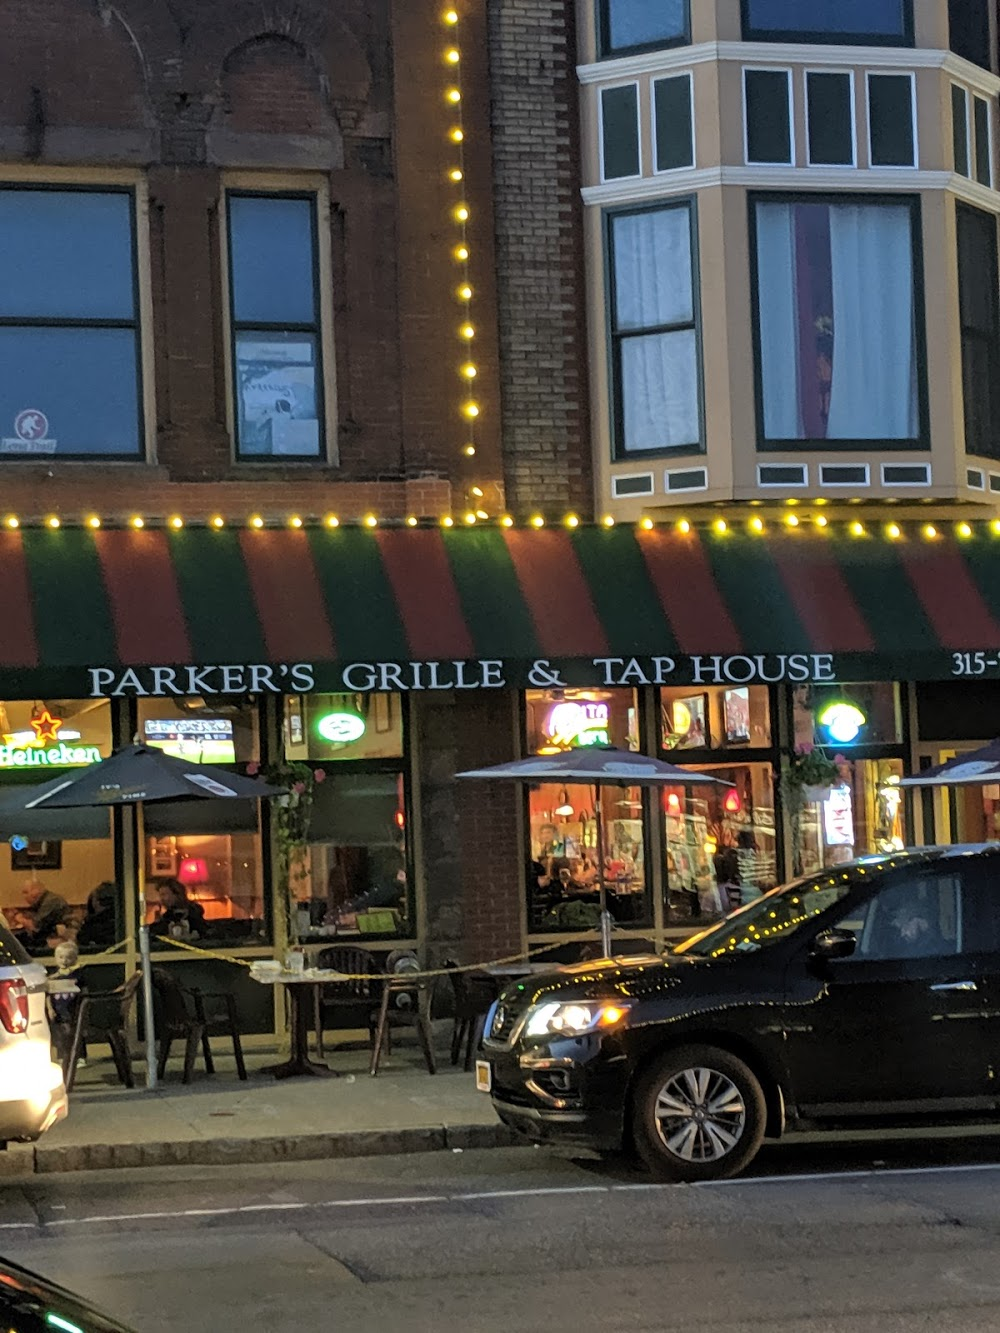 Parker's Grille & Tap House